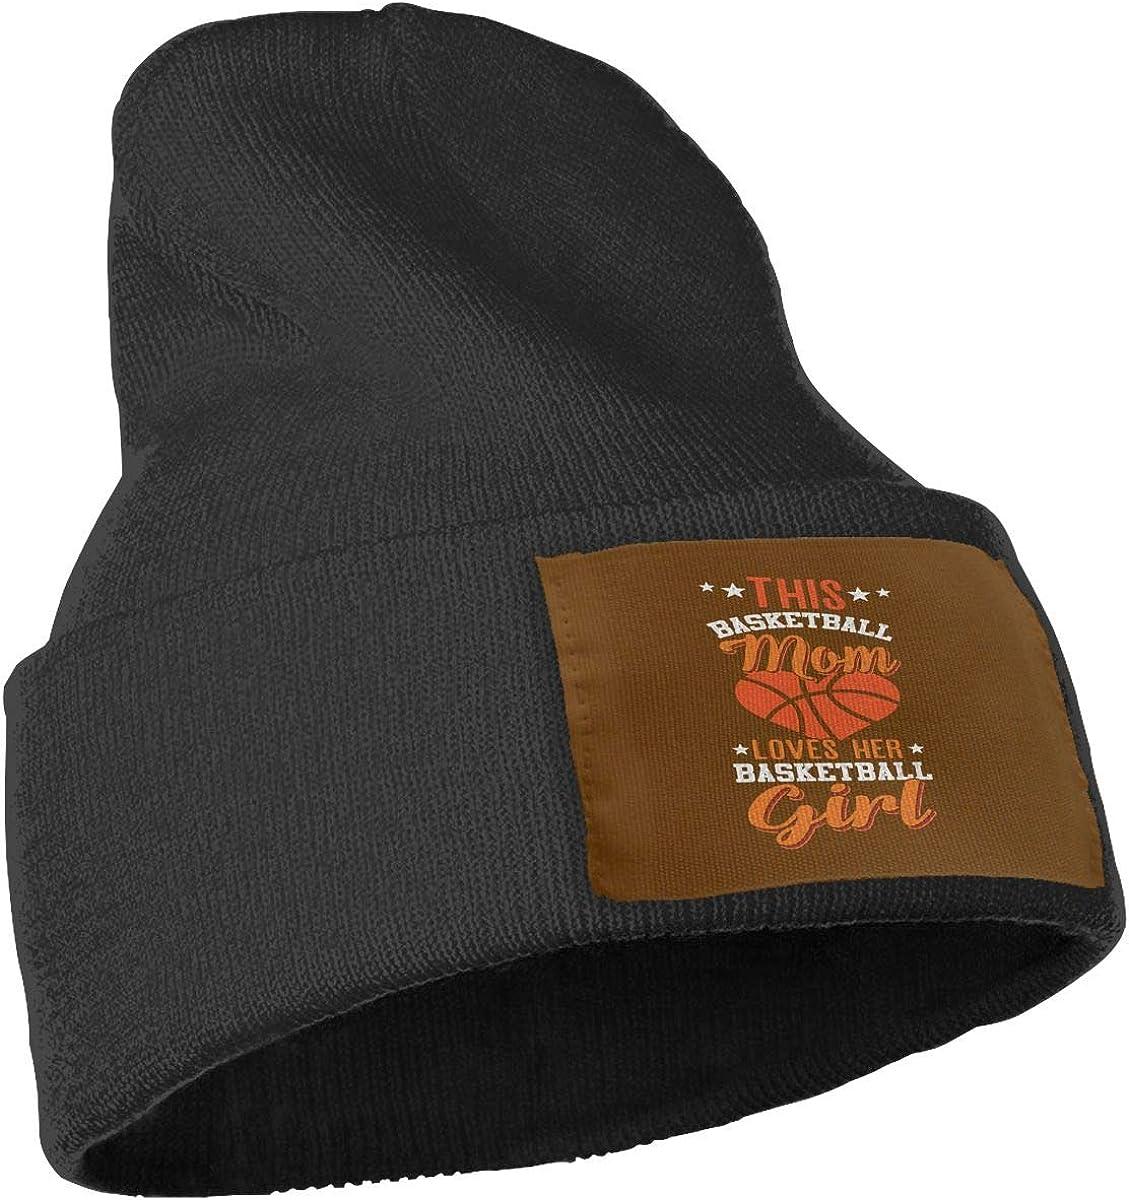 JZMY6 This Basketball Mom Soft Warm Beanie Hat Skull Cap